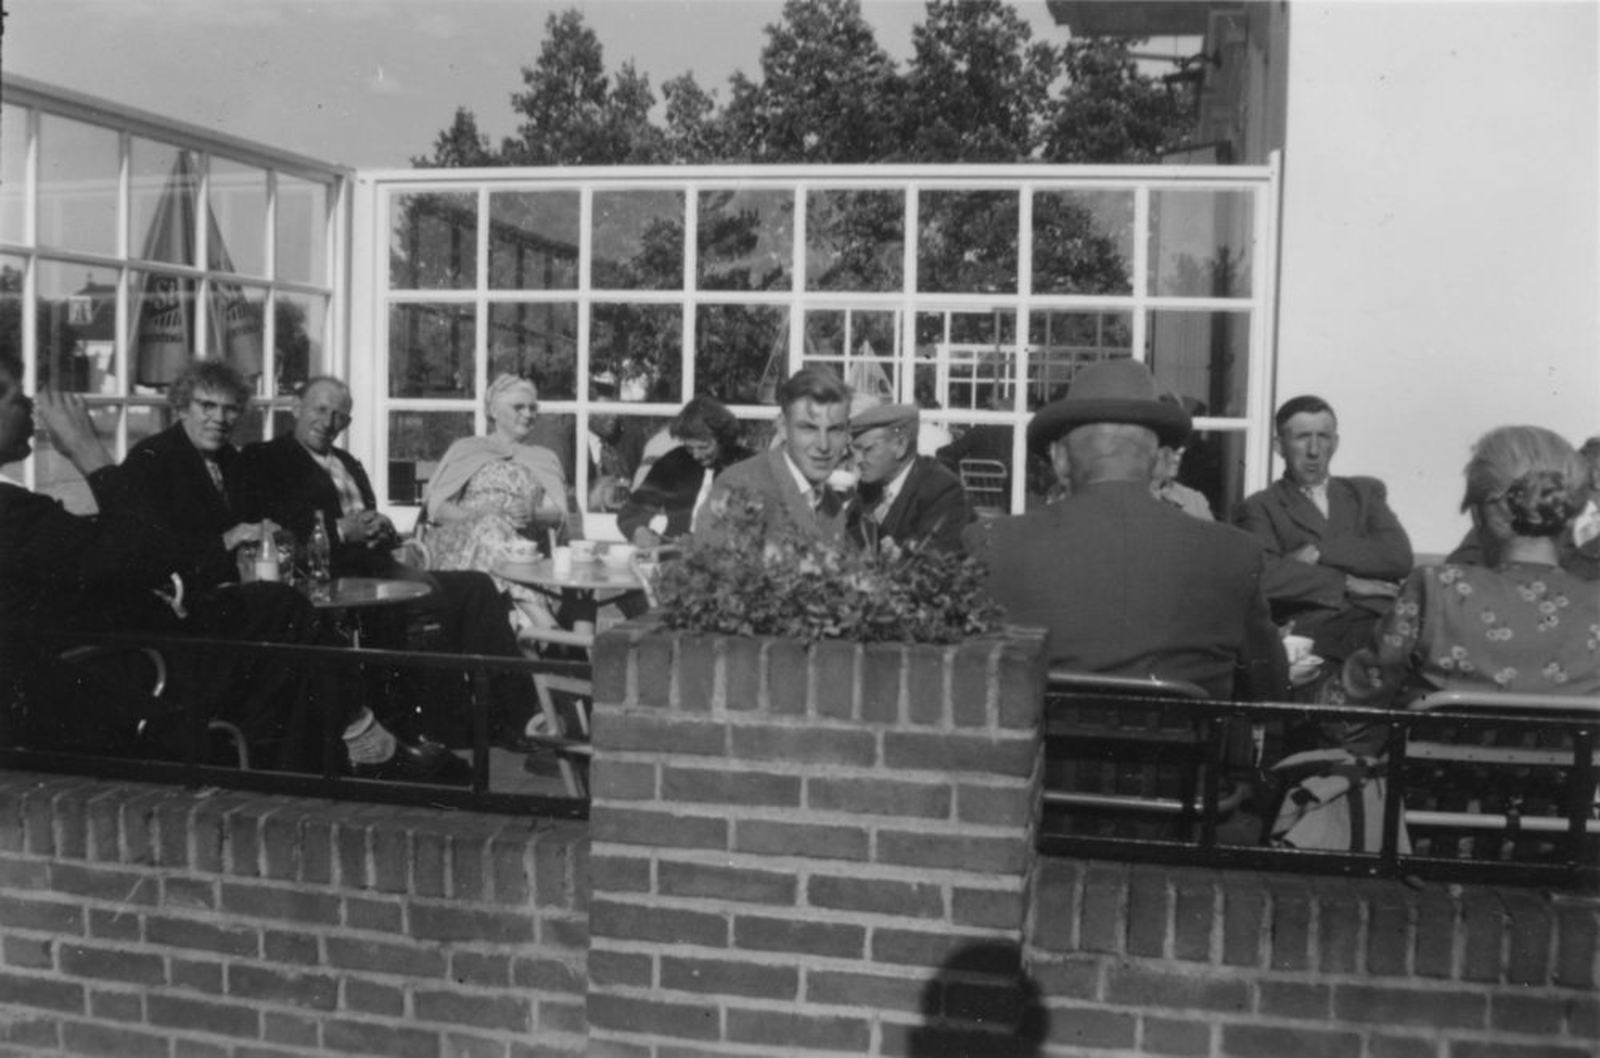 <b>ZOEKPLAATJE:</b>Vuren-Malipaard Pietertje v 1900 19__ Onbekend 13 Uitje